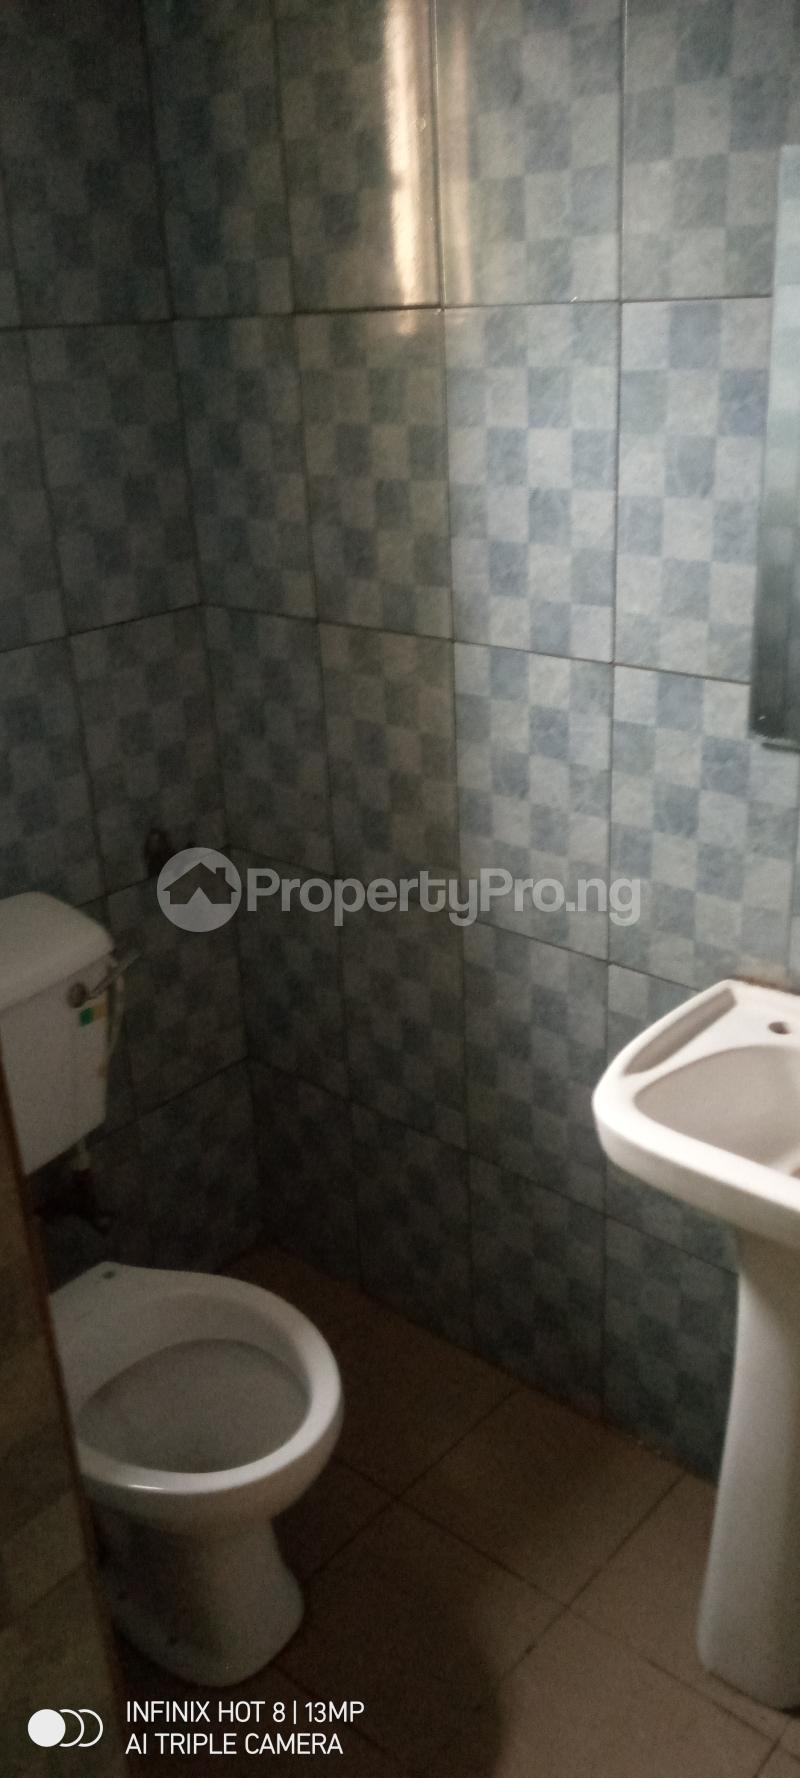 3 bedroom Flat / Apartment for rent Green field estate Amuwo Odofin Amuwo Odofin Lagos - 13